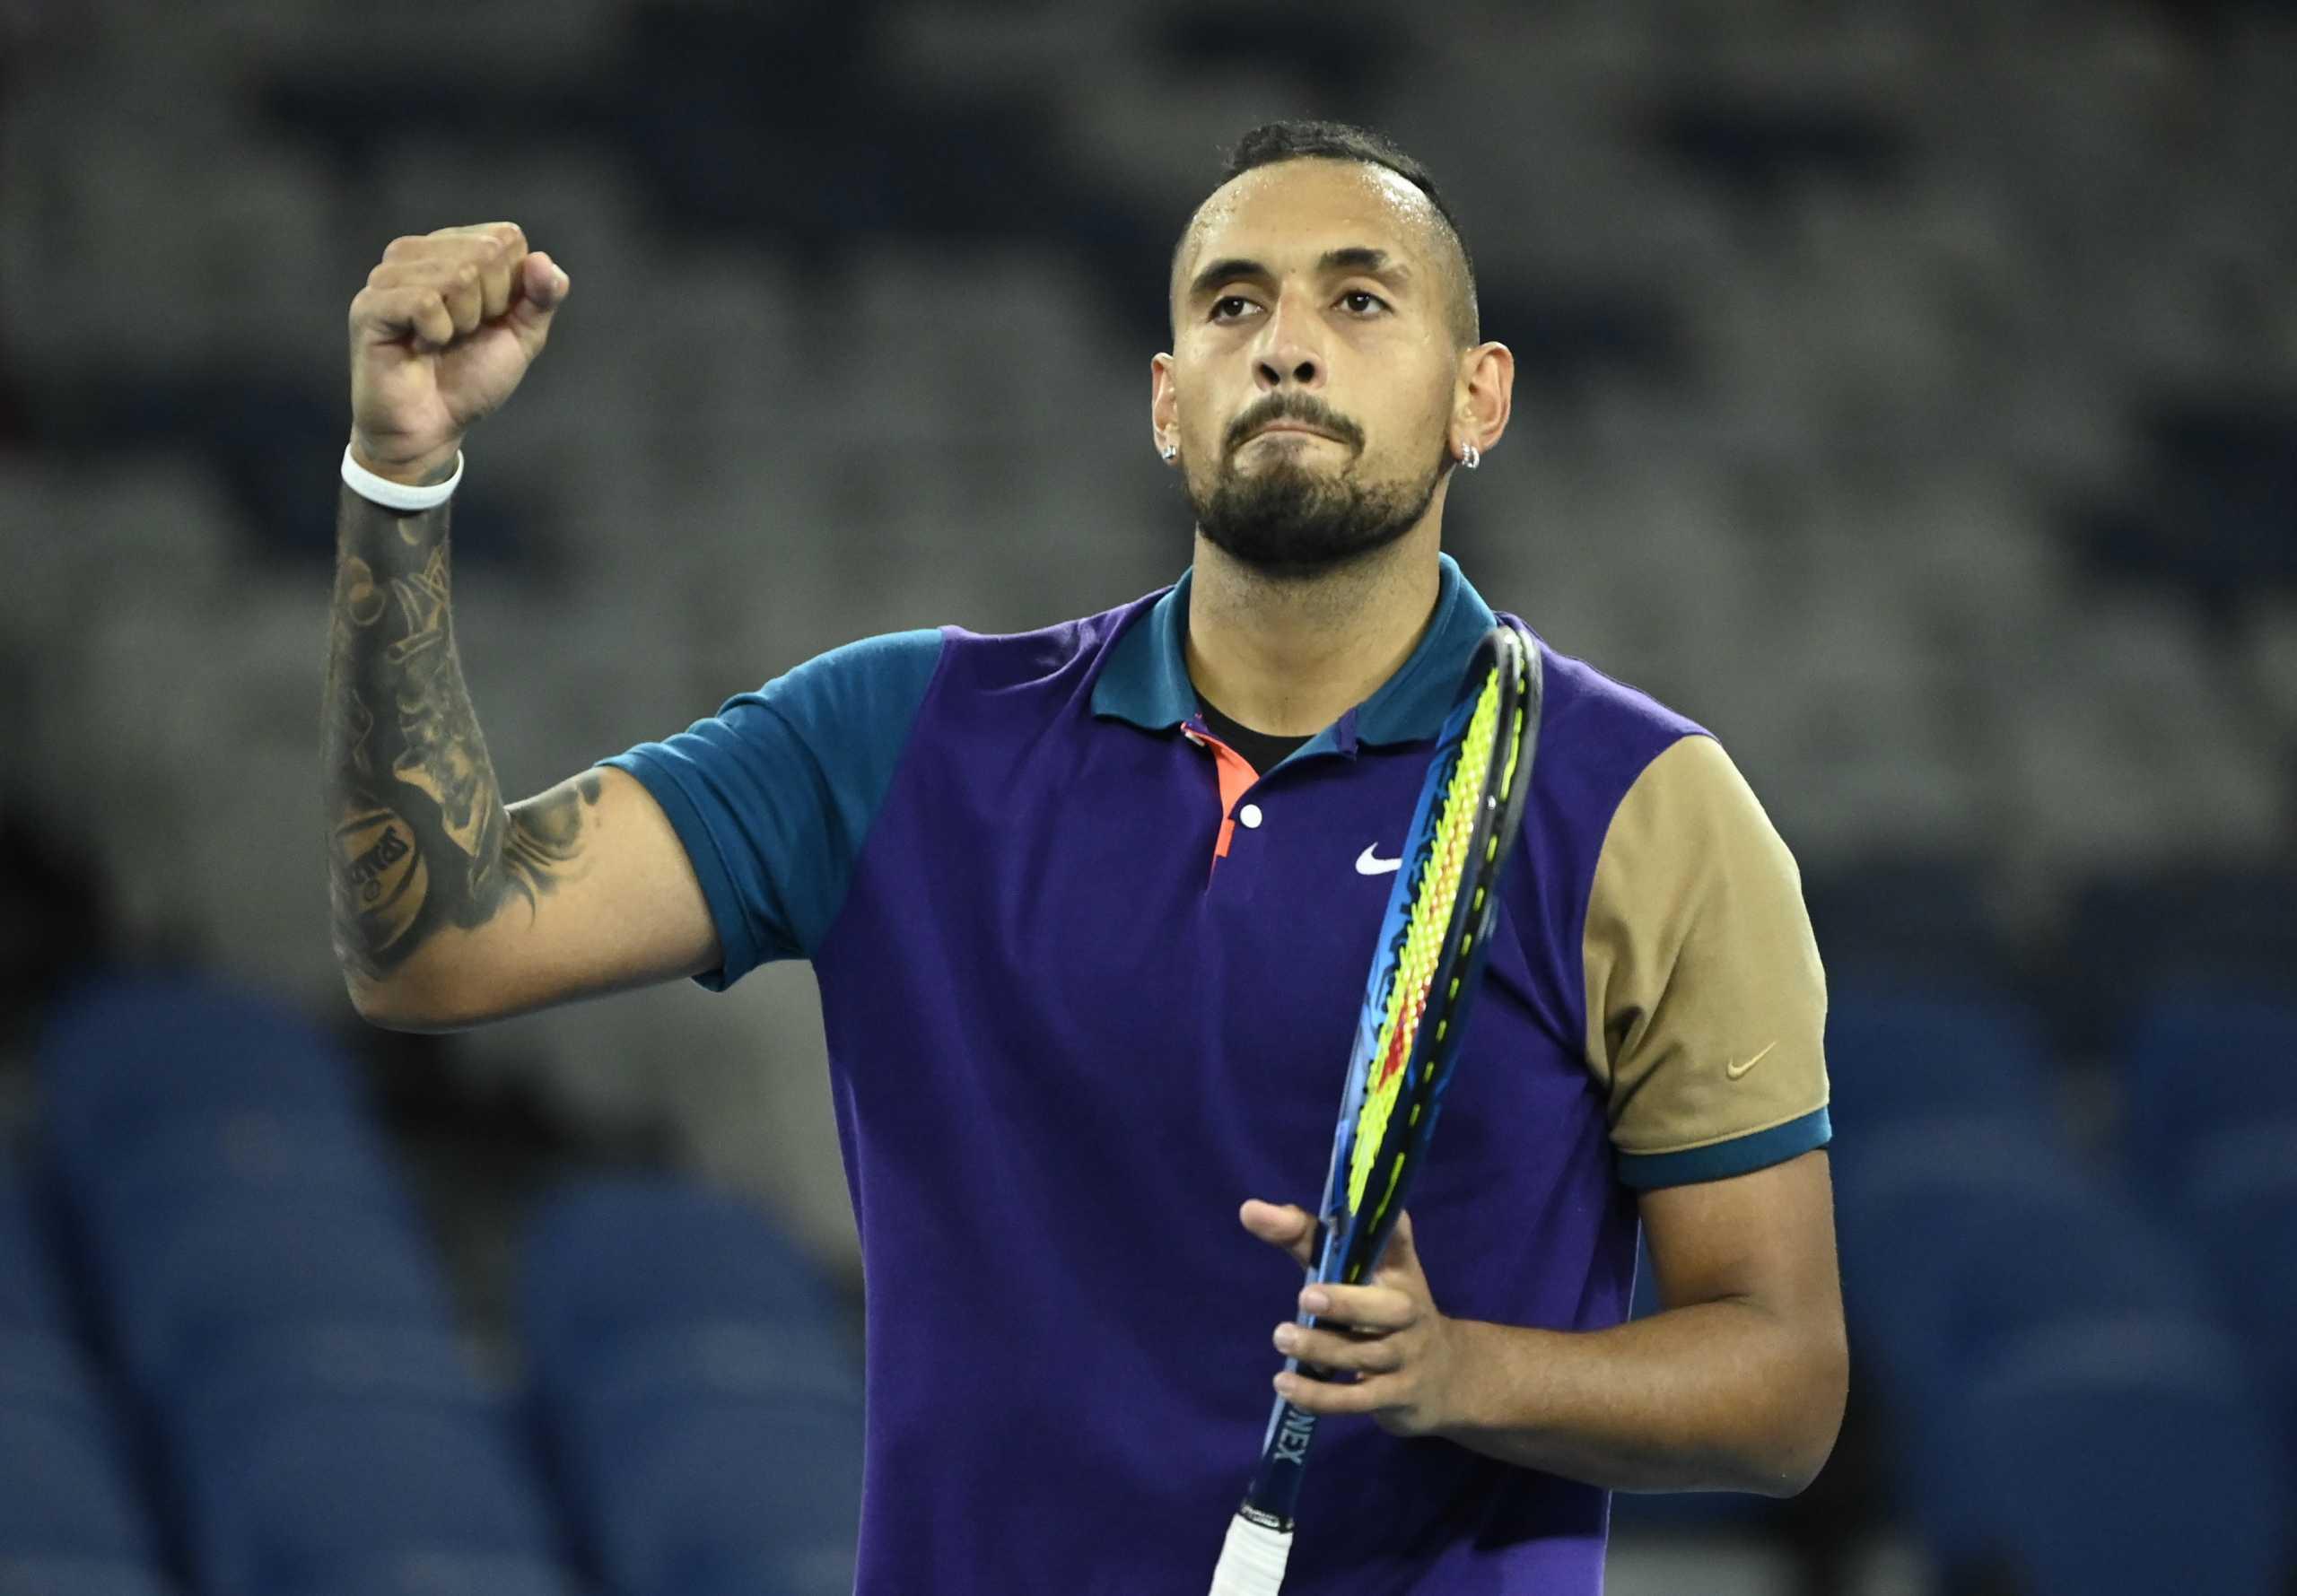 Australian Open: Πρόκριση για Κύργιο με νεύρα και «μαγεία» (videos)